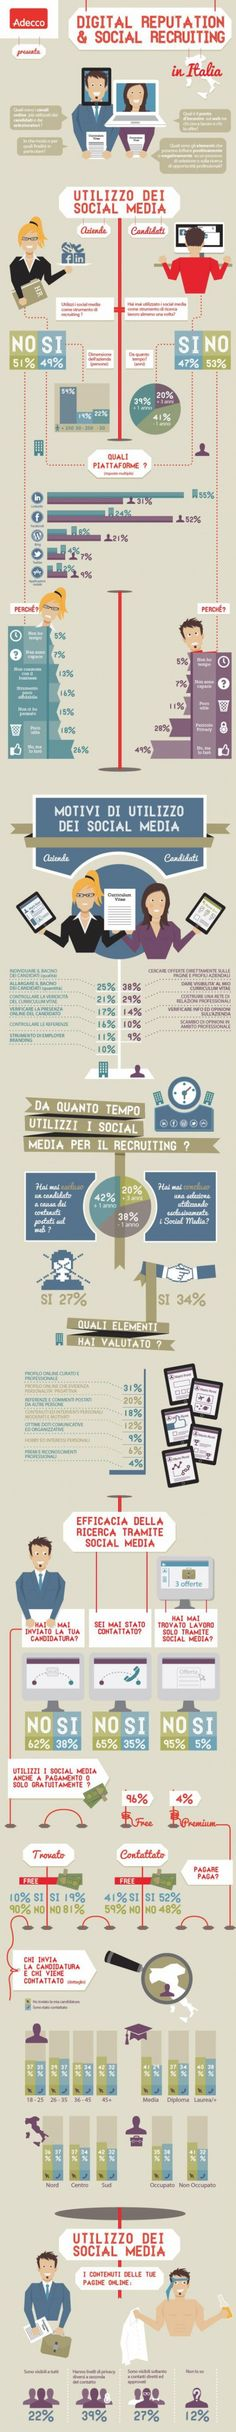 Social Recruiting in Italia! ....(in Italy)